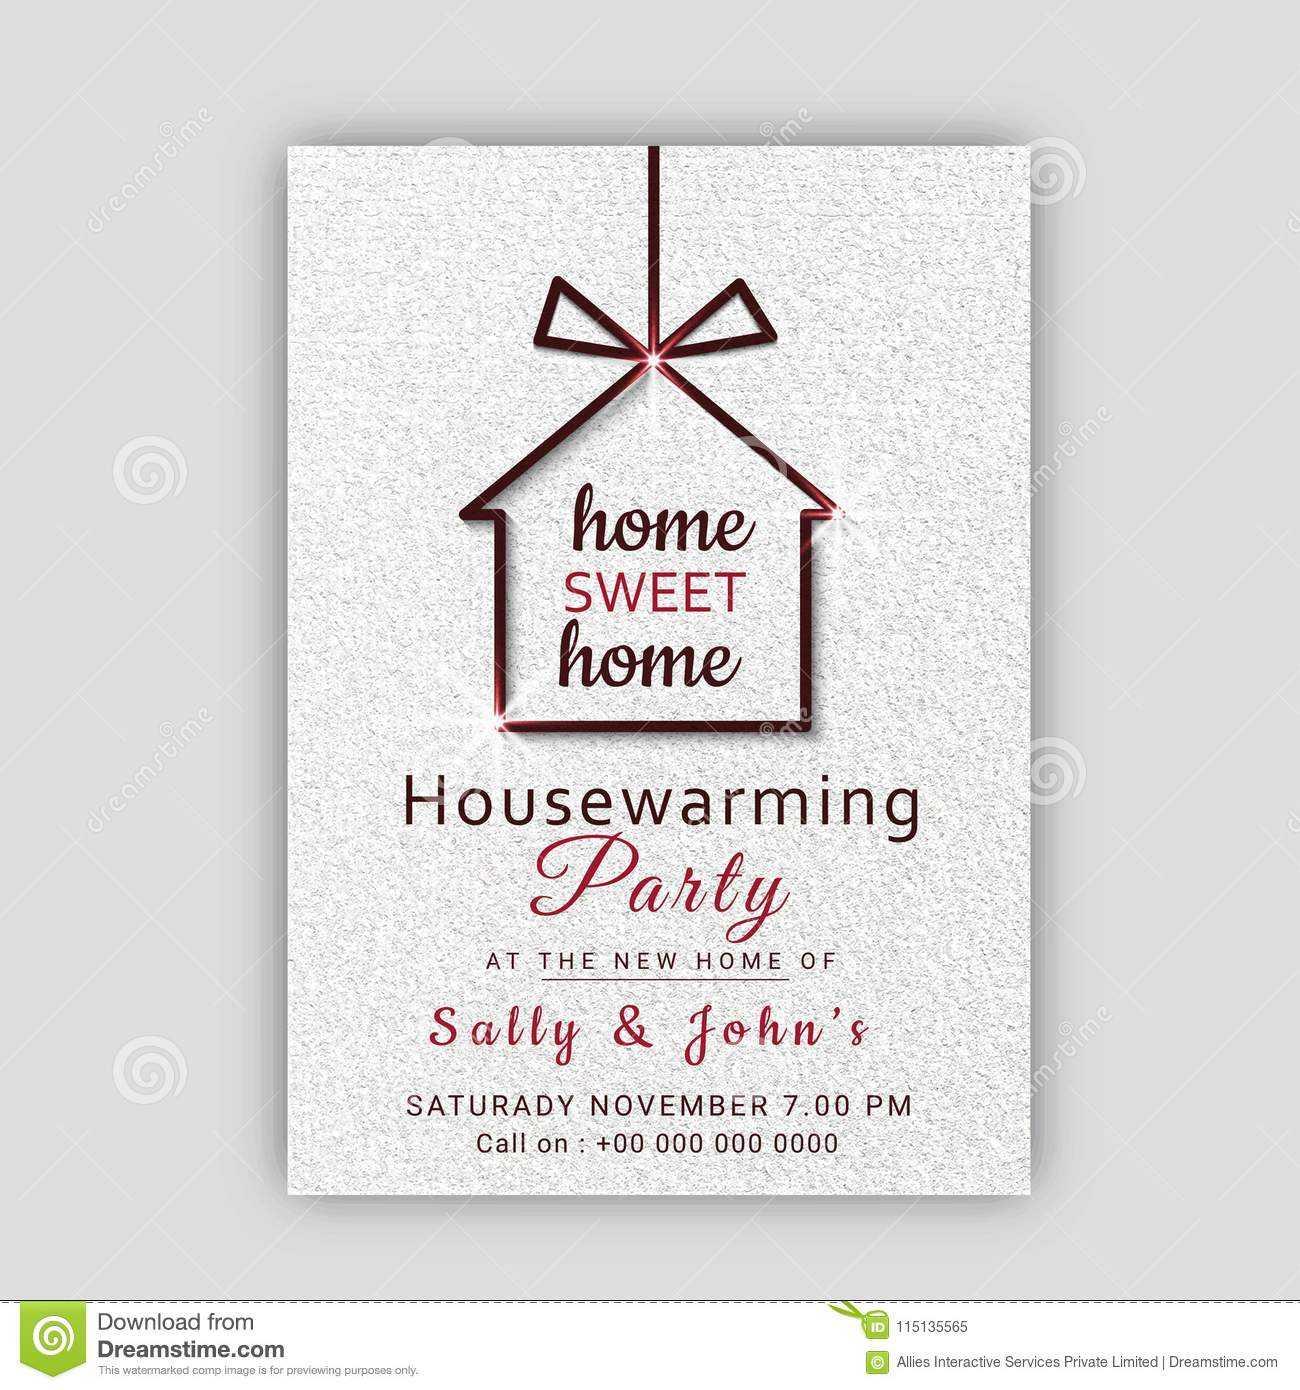 Housewarming Party Invitation Card Design. Stock In Free Housewarming Invitation Card Template